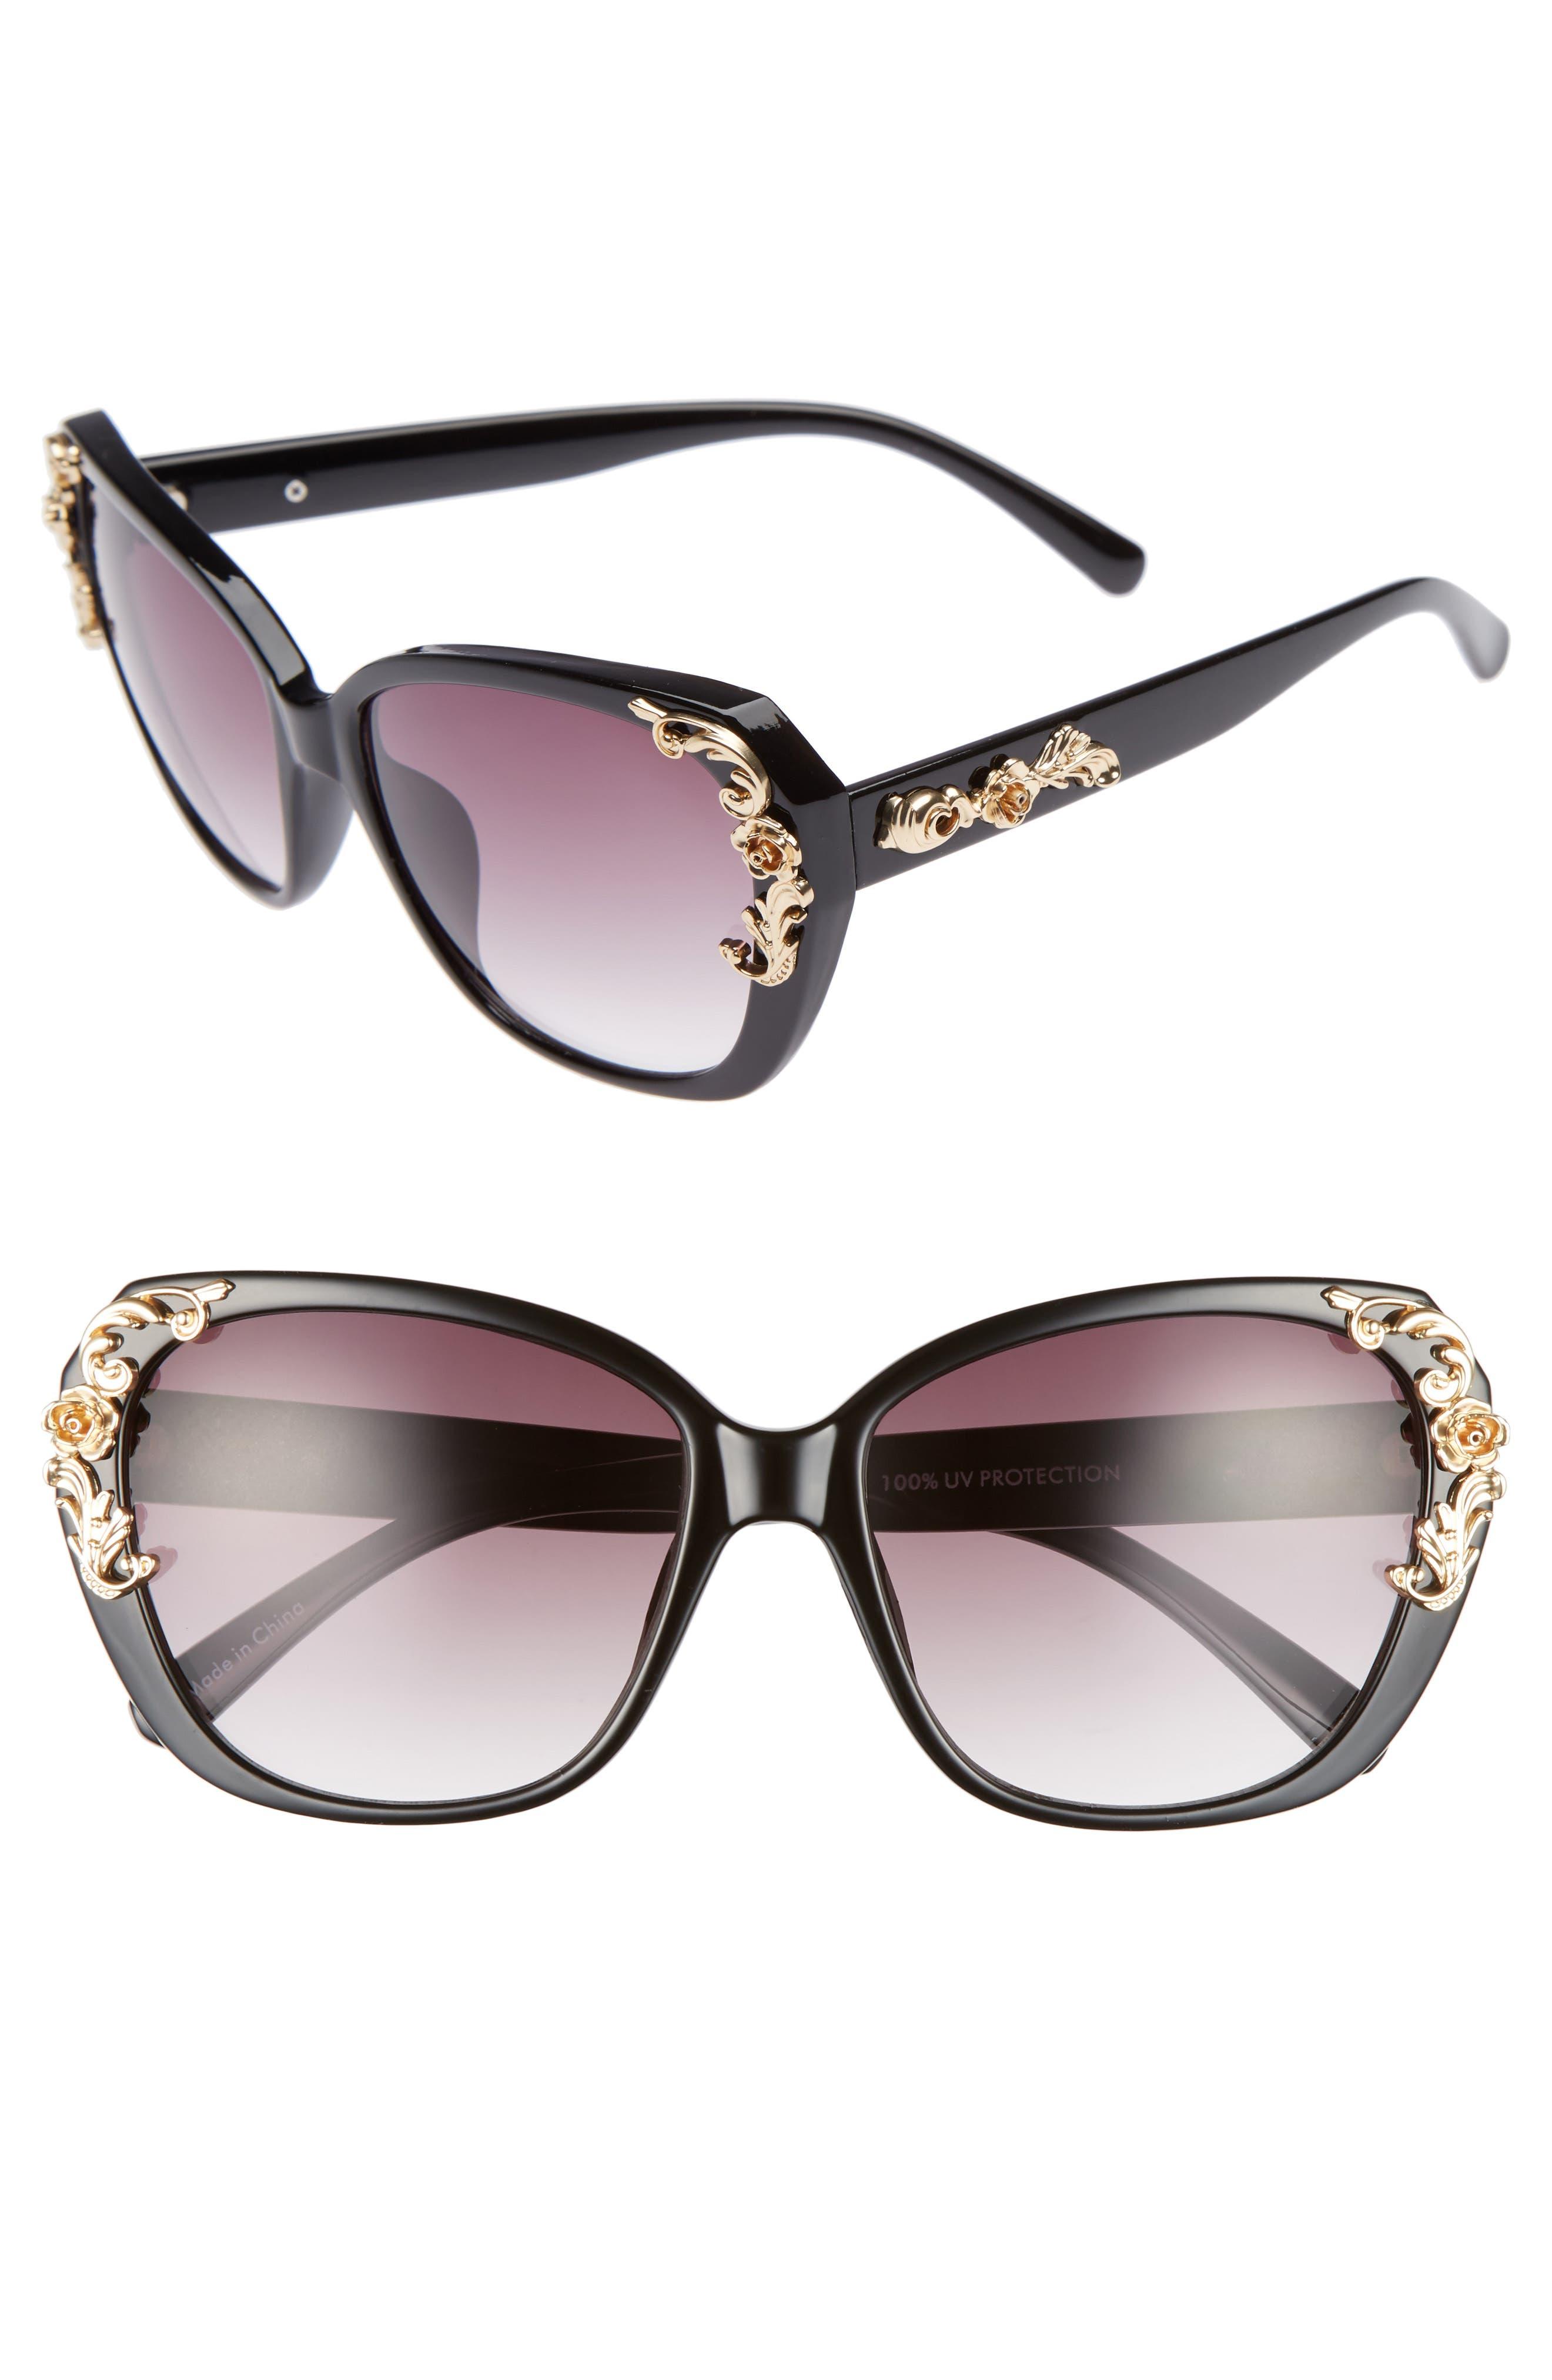 56mm Filigree Embellished Square Sunglasses,                             Main thumbnail 1, color,                             005